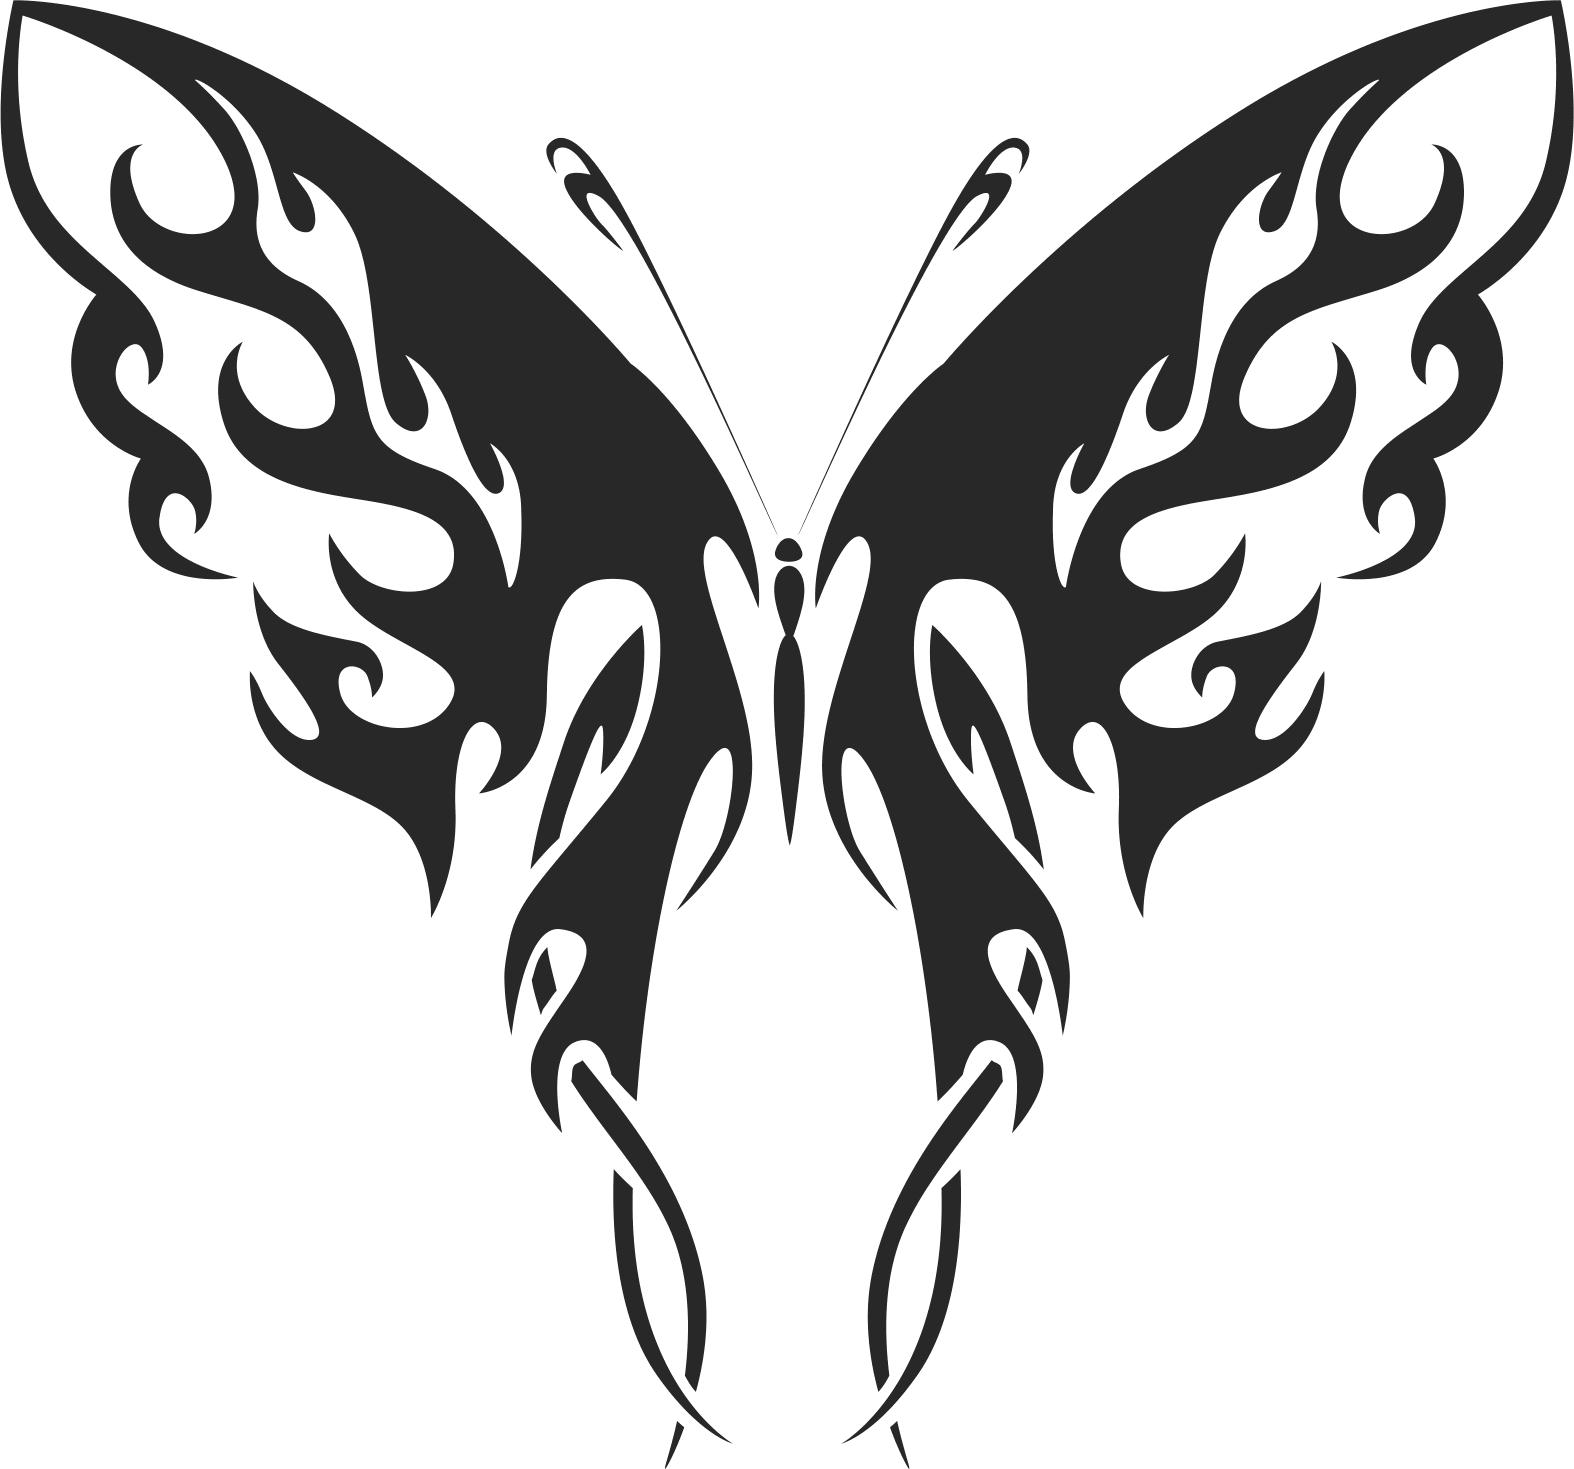 Butterfly Vector Art 041 Free CDR Vectors Art